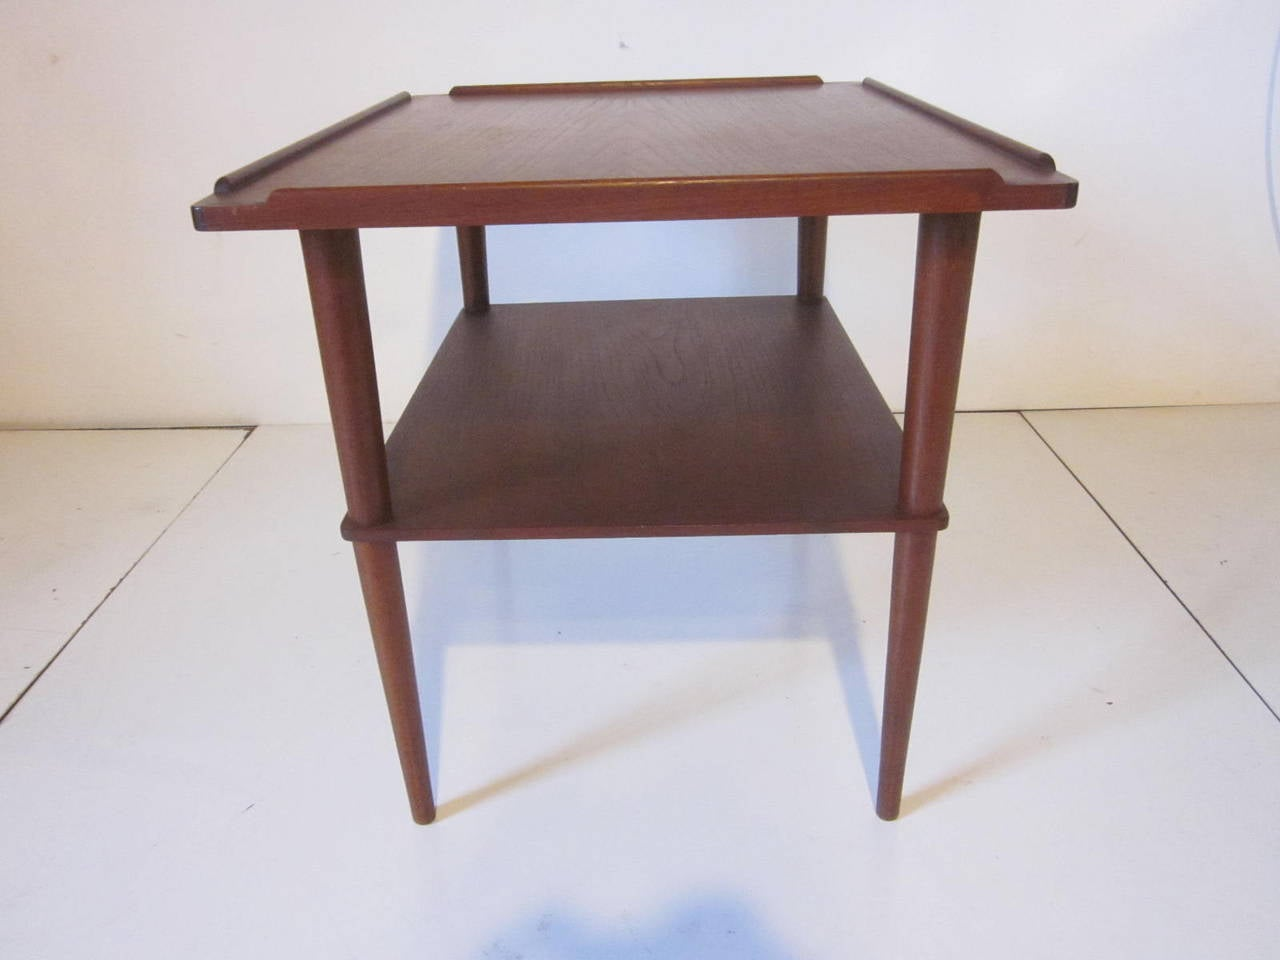 Arne Hovmand-Olsen Danish Teak Wood Side Table In Good Condition For Sale In Cincinnati, OH